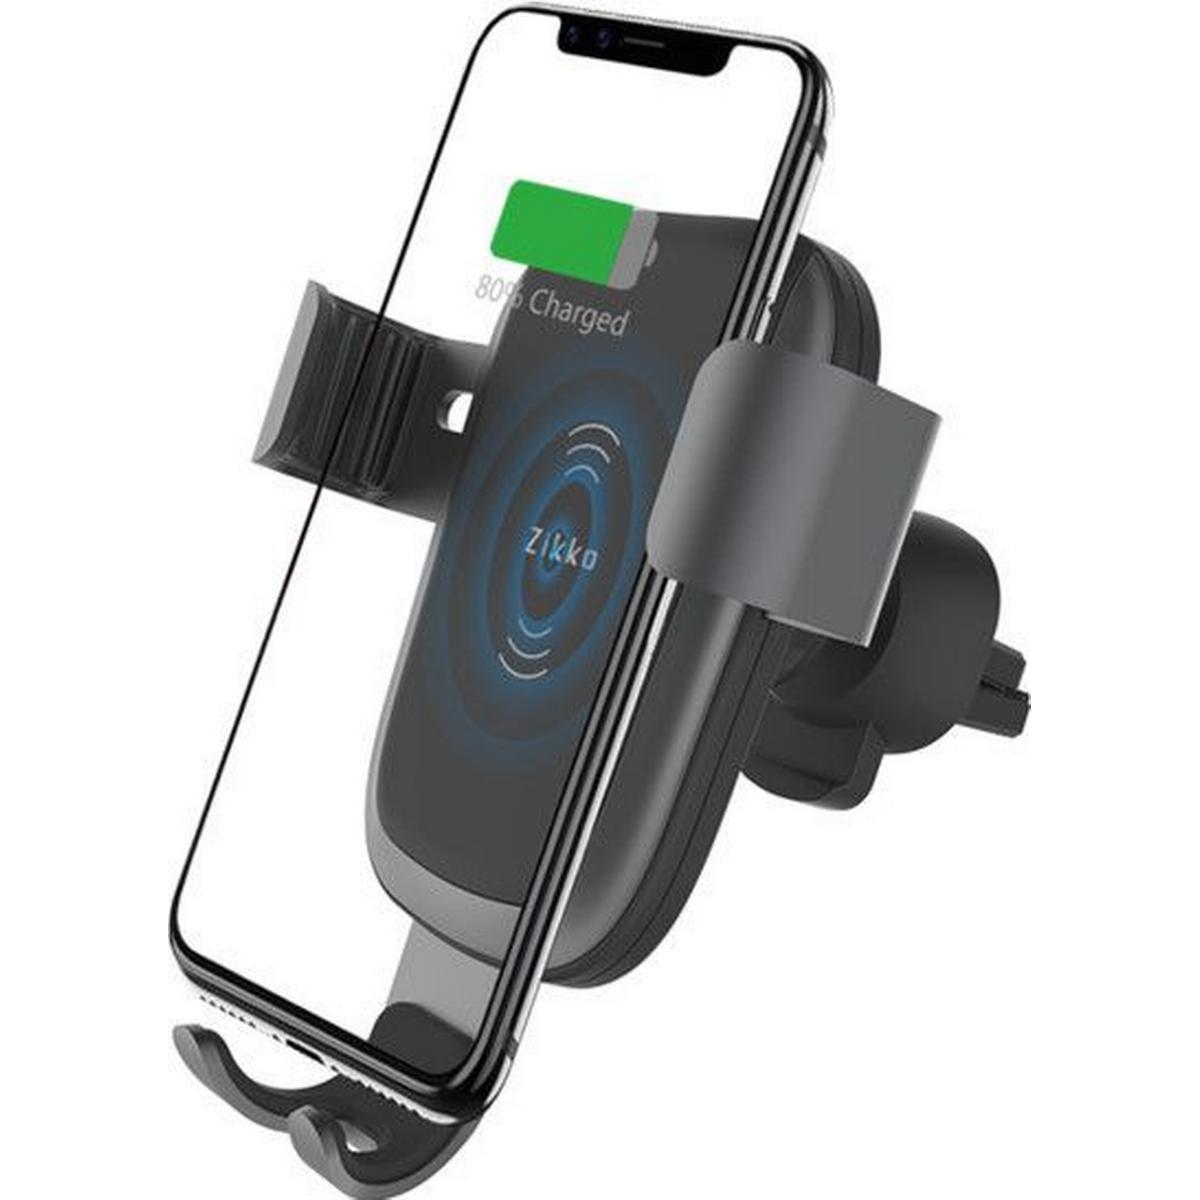 Bakeey Qi Trådlös Laddare Med LED Indikator För iPhone X 8 8Plus Samsung S7 S8 Note 8